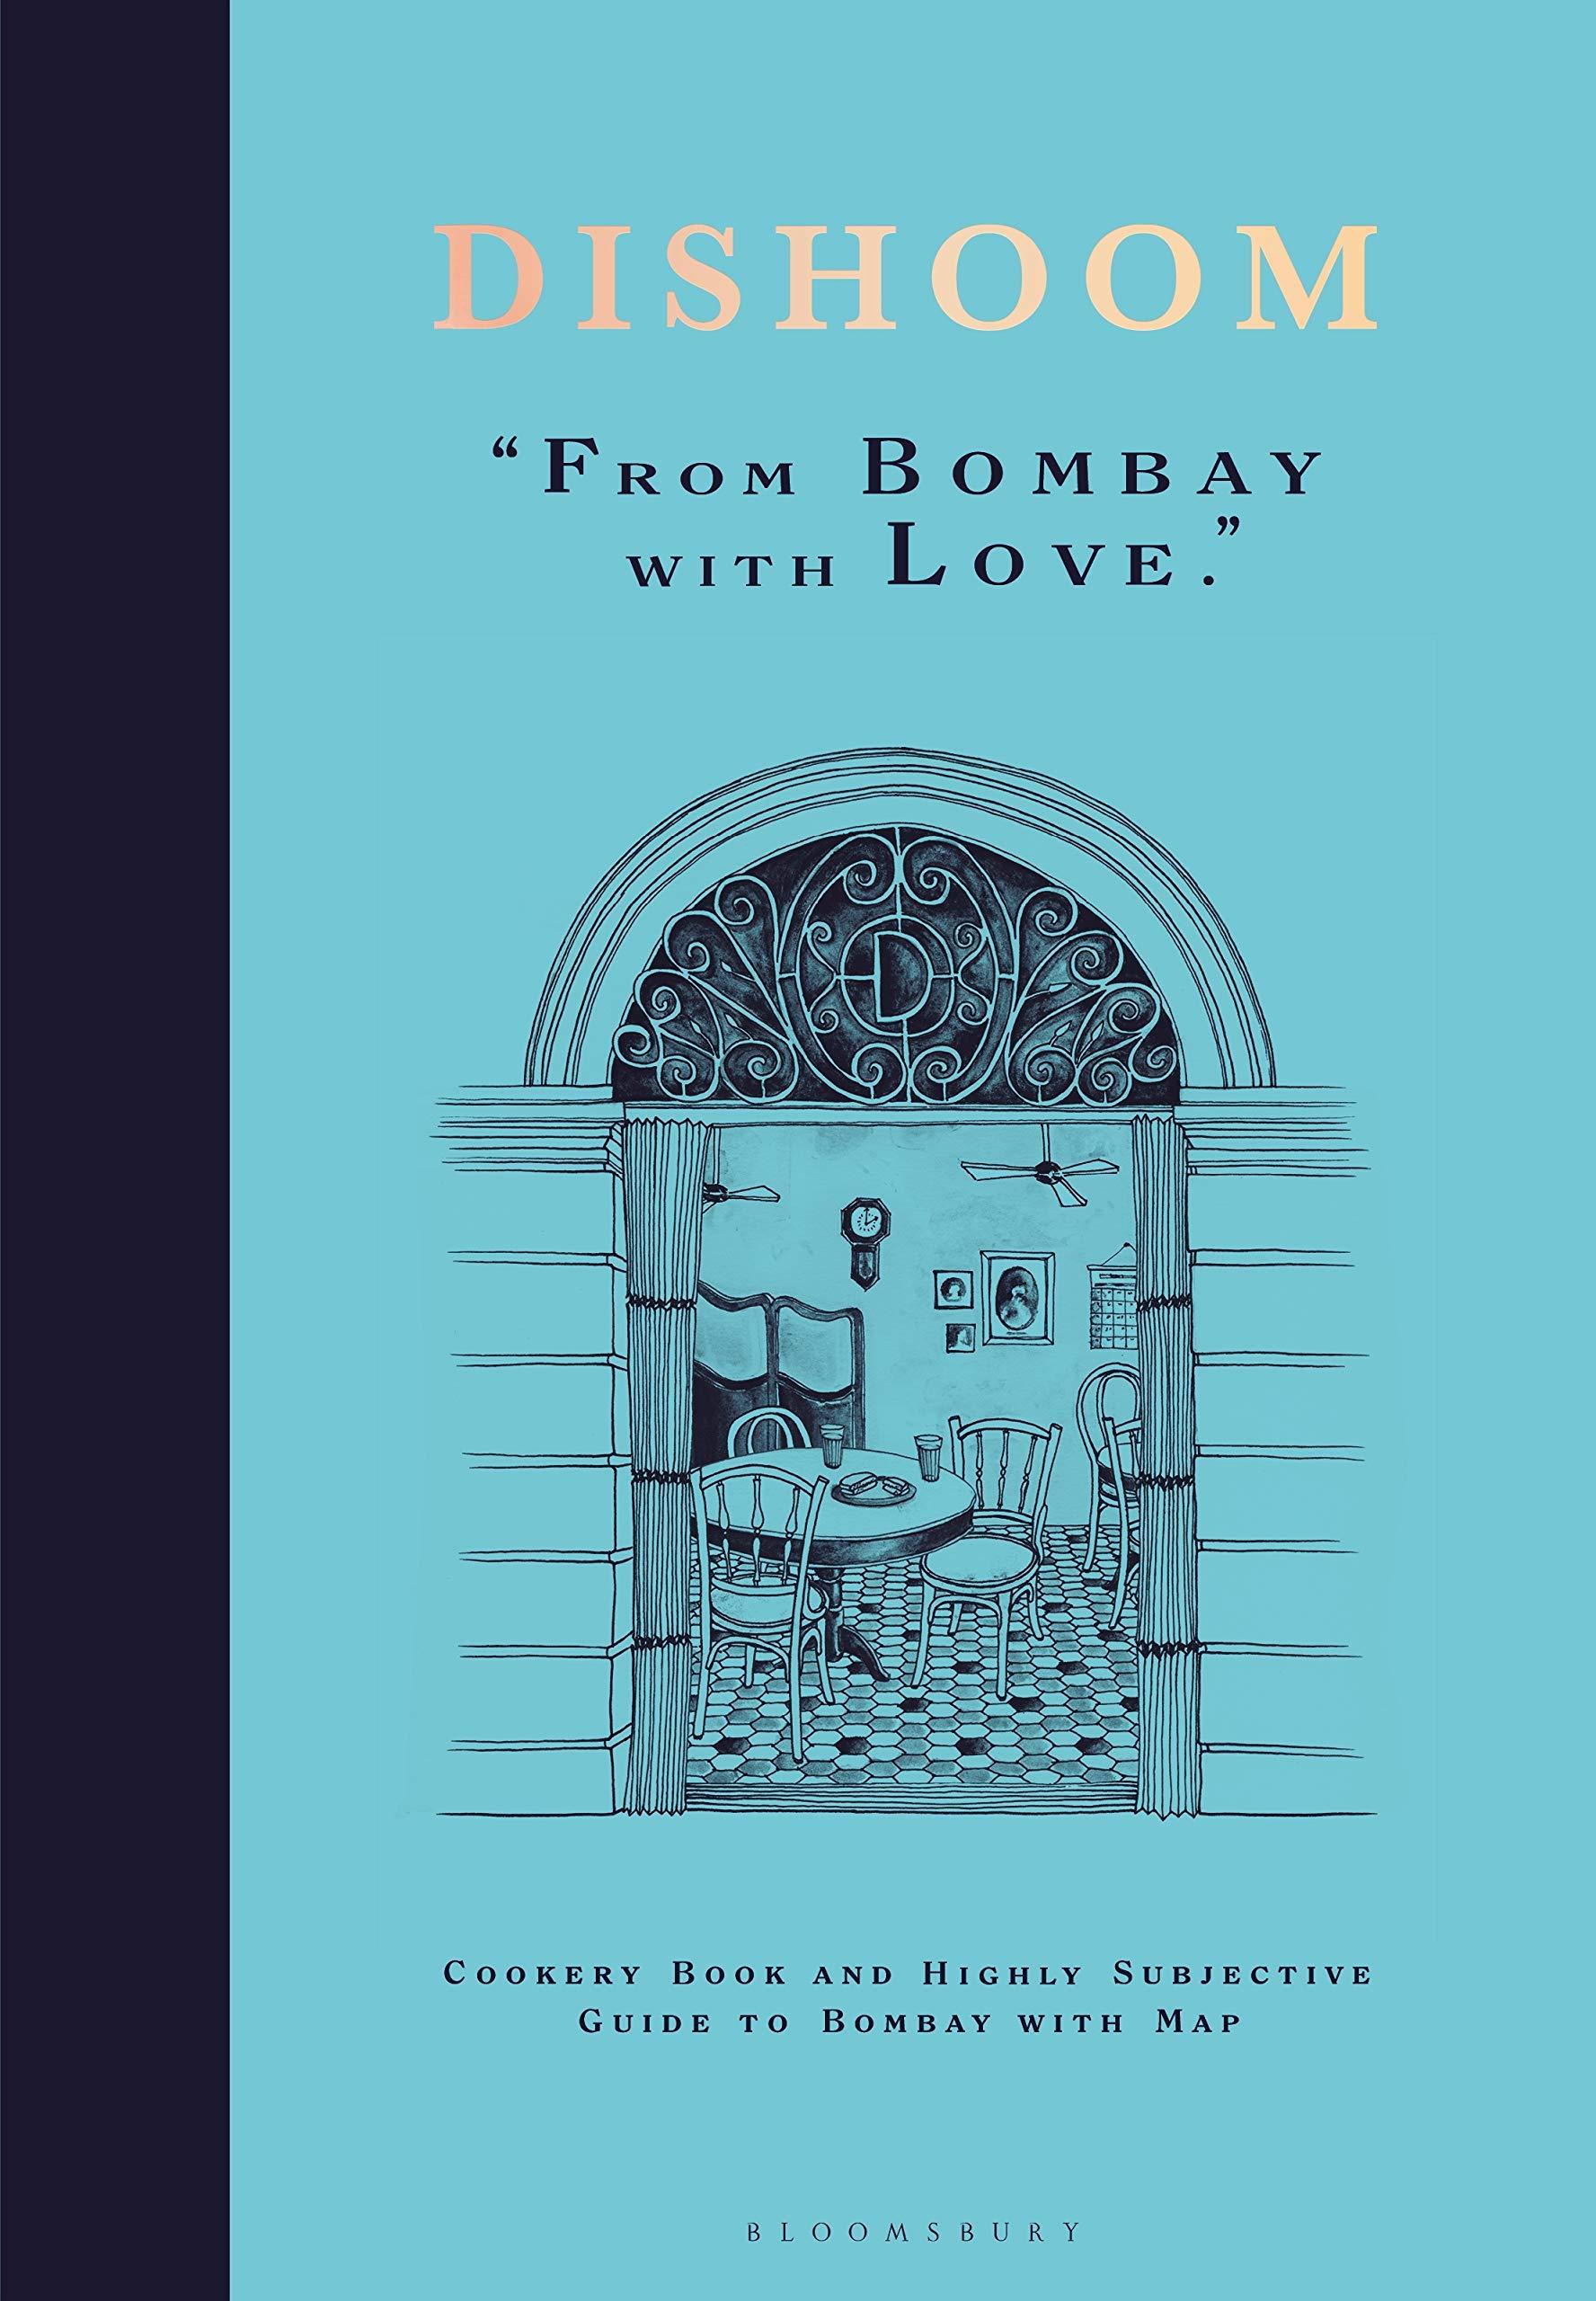 Dishoom The First Ever Cookbook From The Much Loved Indian Restaurant Amazon Co Uk Thakrar Shamil Thakrar Kavi Nasir Naved Books